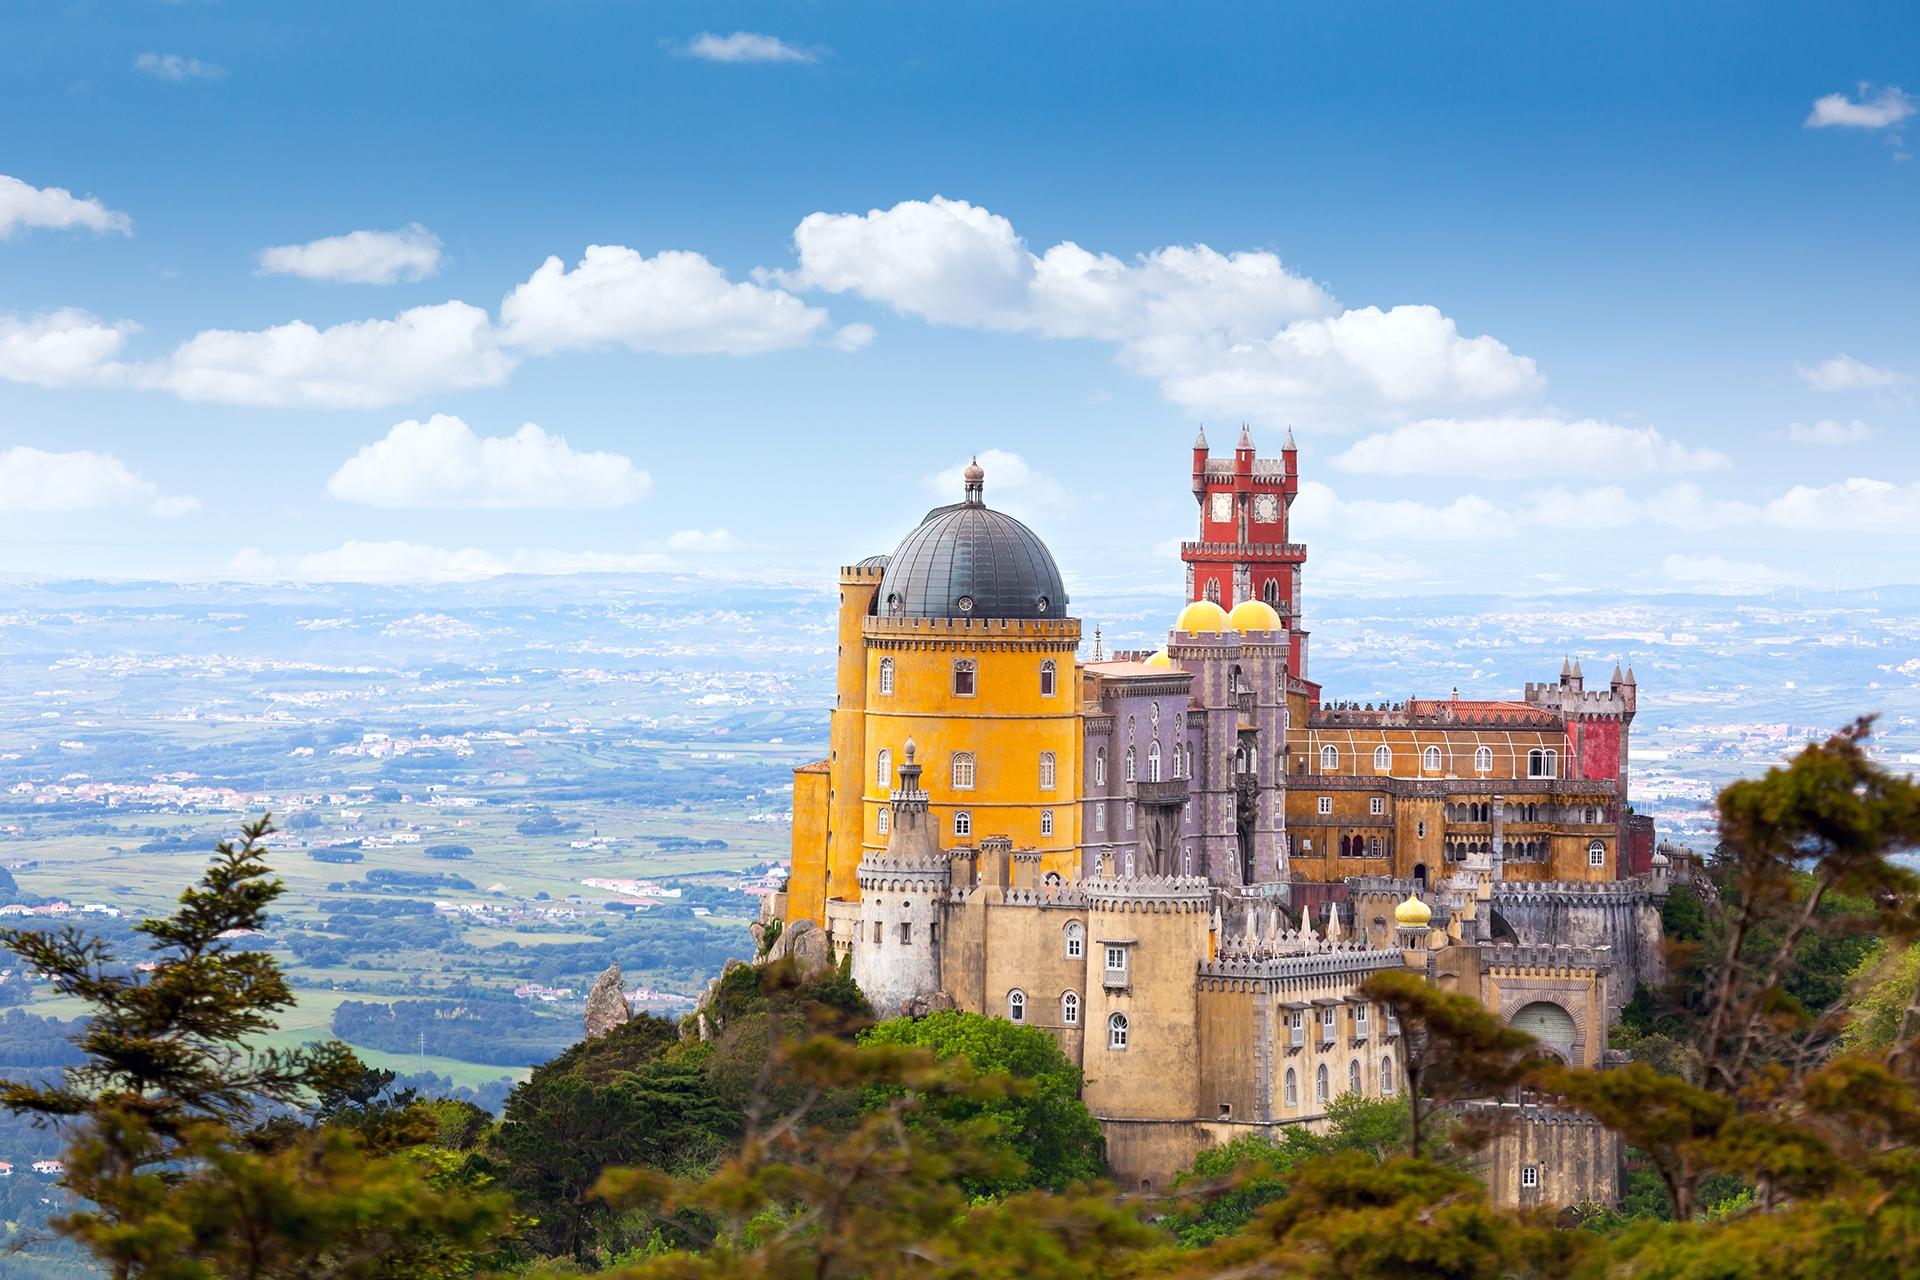 Aerial-view-of-Palace-da-Pena-Sintra-Lisboa-Portugal-European-travel-Horizontal